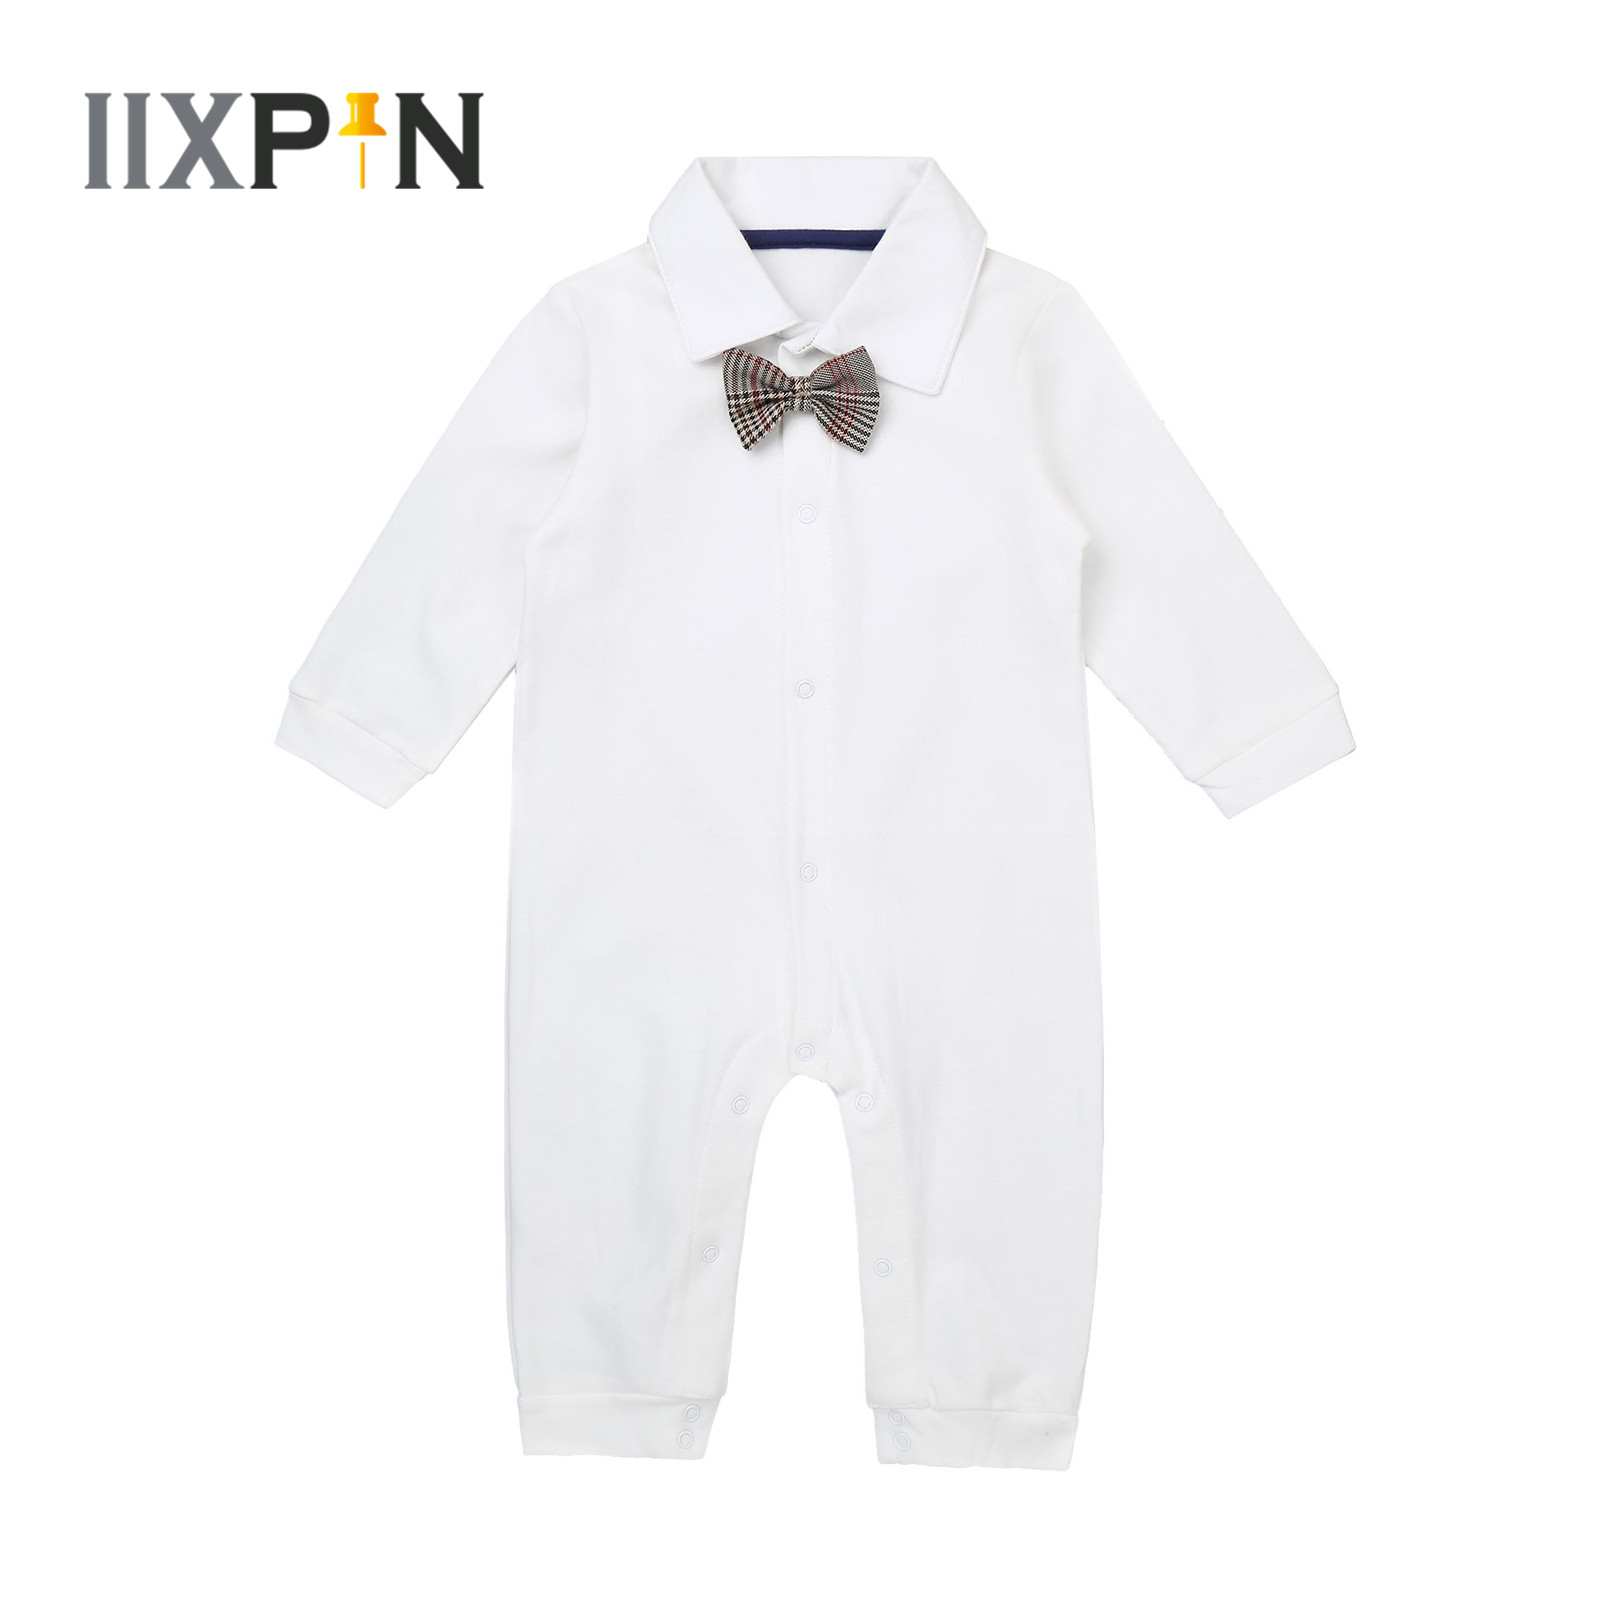 Toddler Baby Boys Romper Infant Rompers Cotton Long Sleeves Jumpsuit Bodysuit Gentlemen Christening Baptism Wear Baby's Clothing